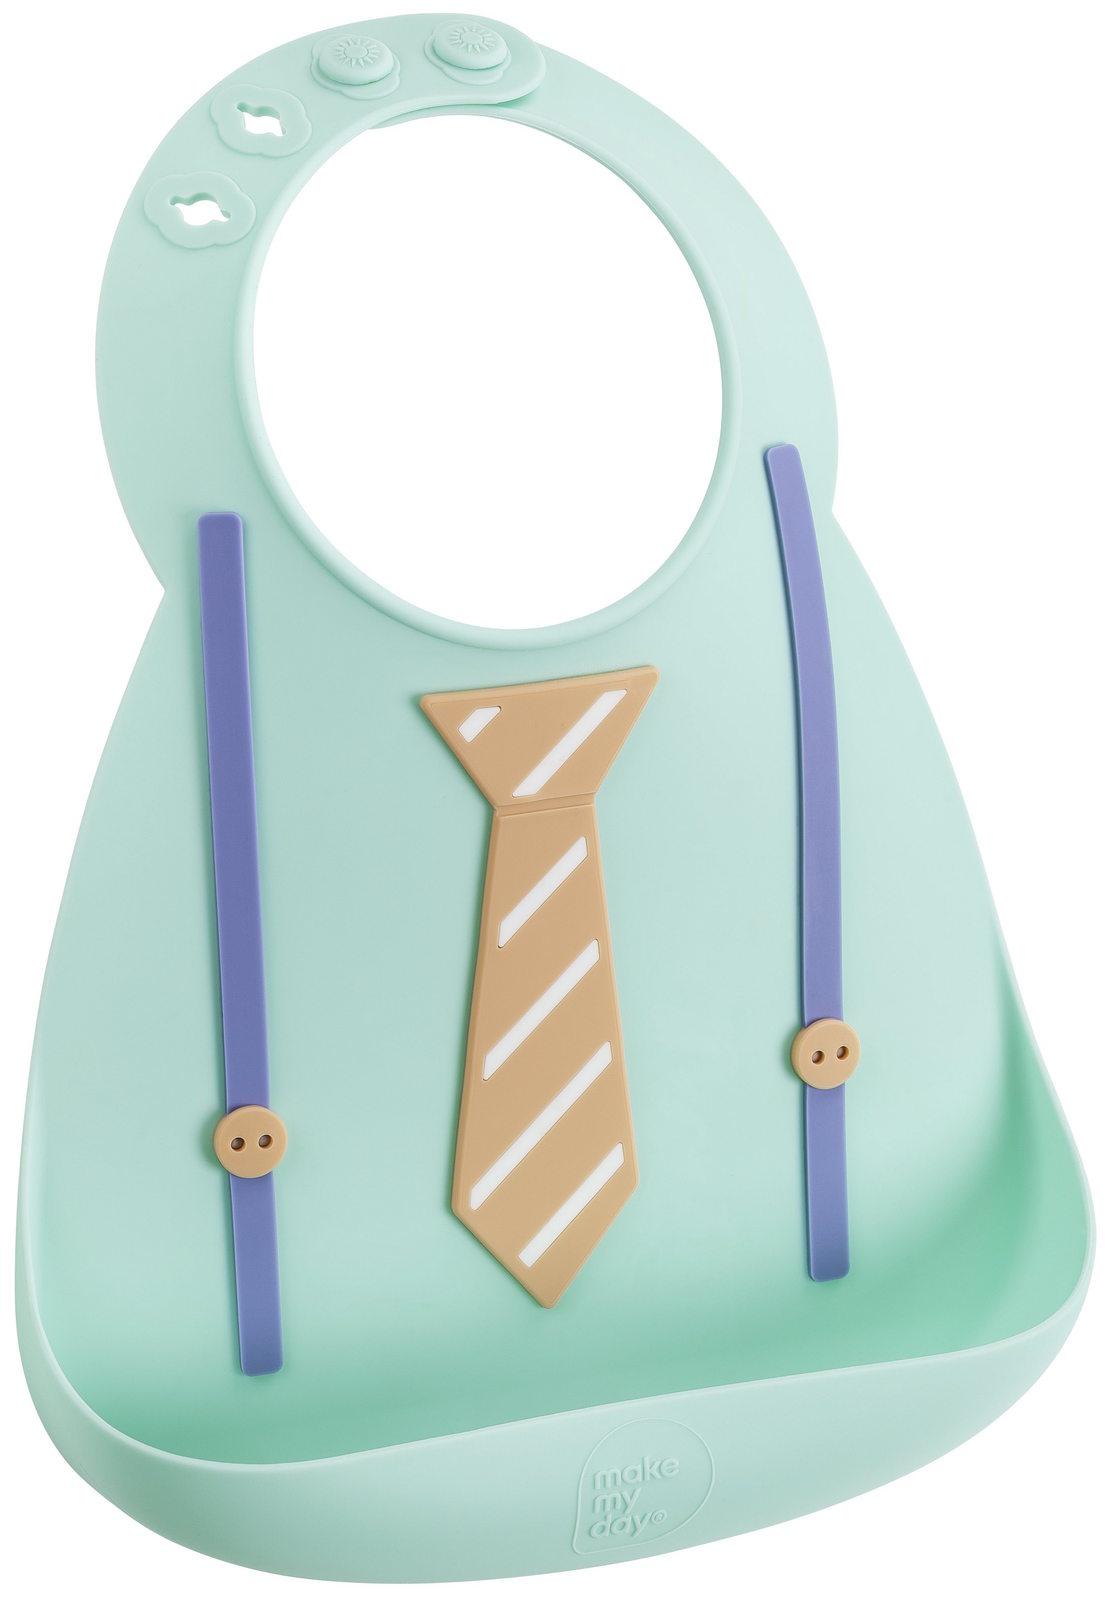 Make My Day: Silicon Baby Bib - Tie & Suspender Green image